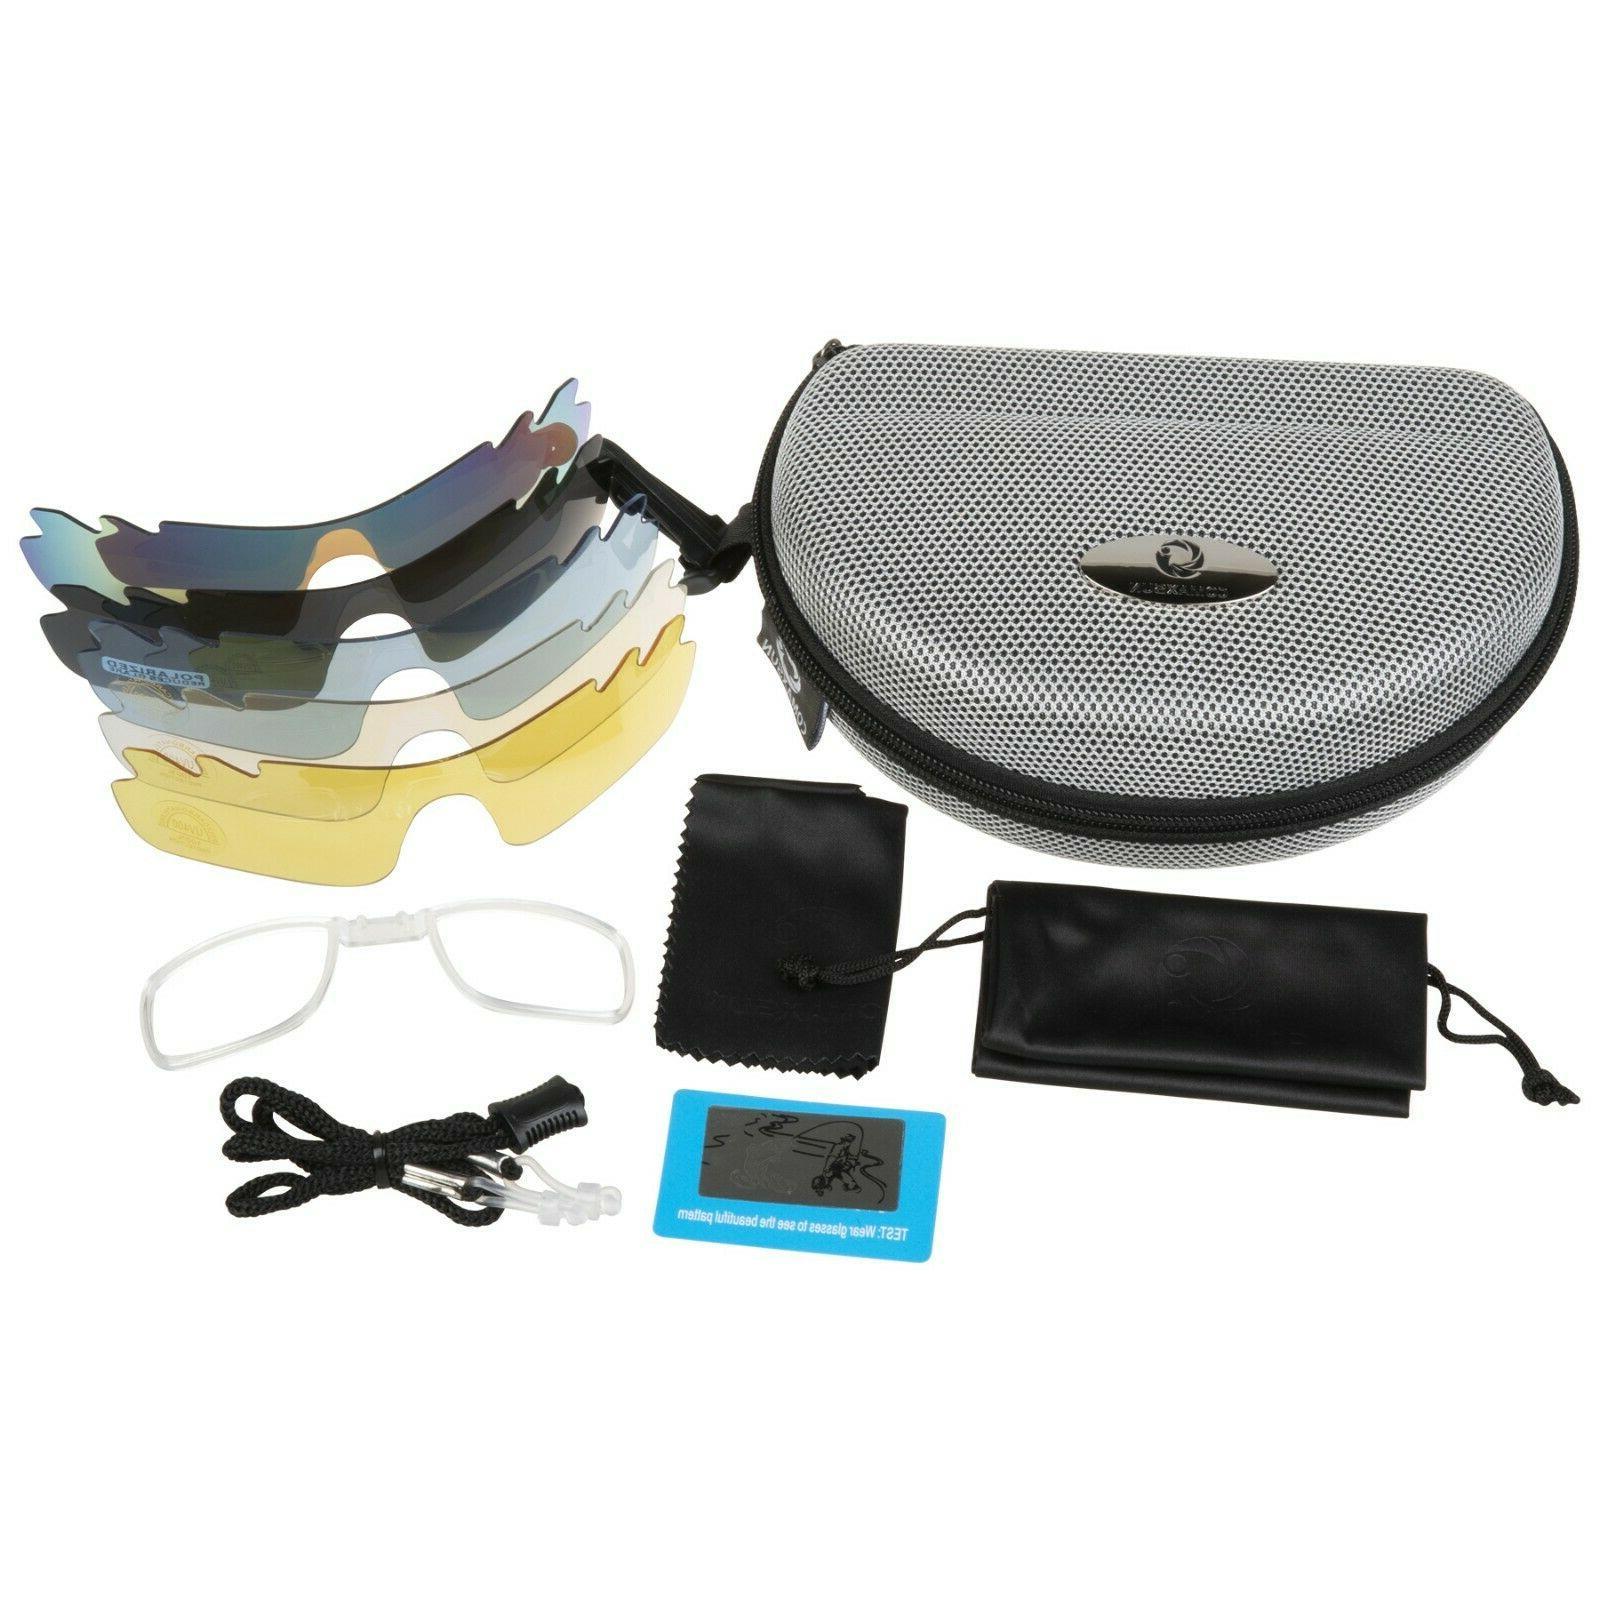 New Polarized Glasses Bike Fishing UV400 5